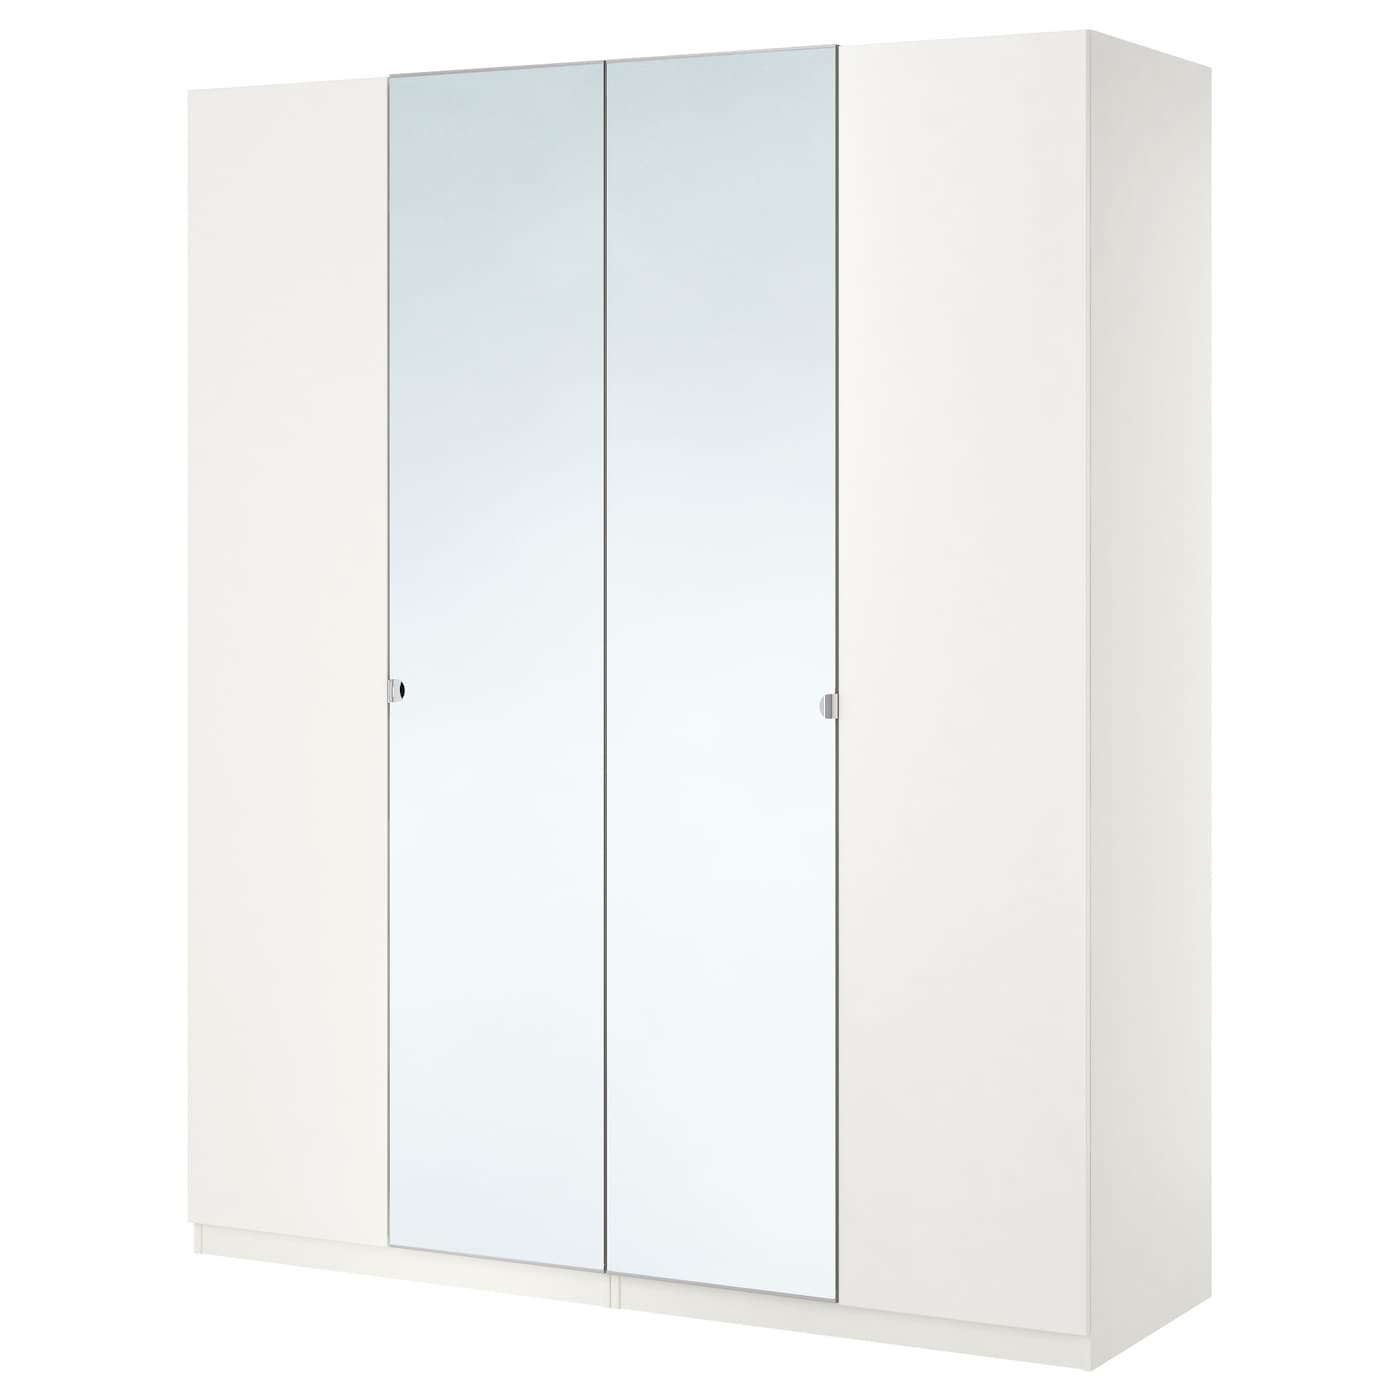 pax armoire penderie blanc tanem vikedal 200x60x201 cm ikea. Black Bedroom Furniture Sets. Home Design Ideas